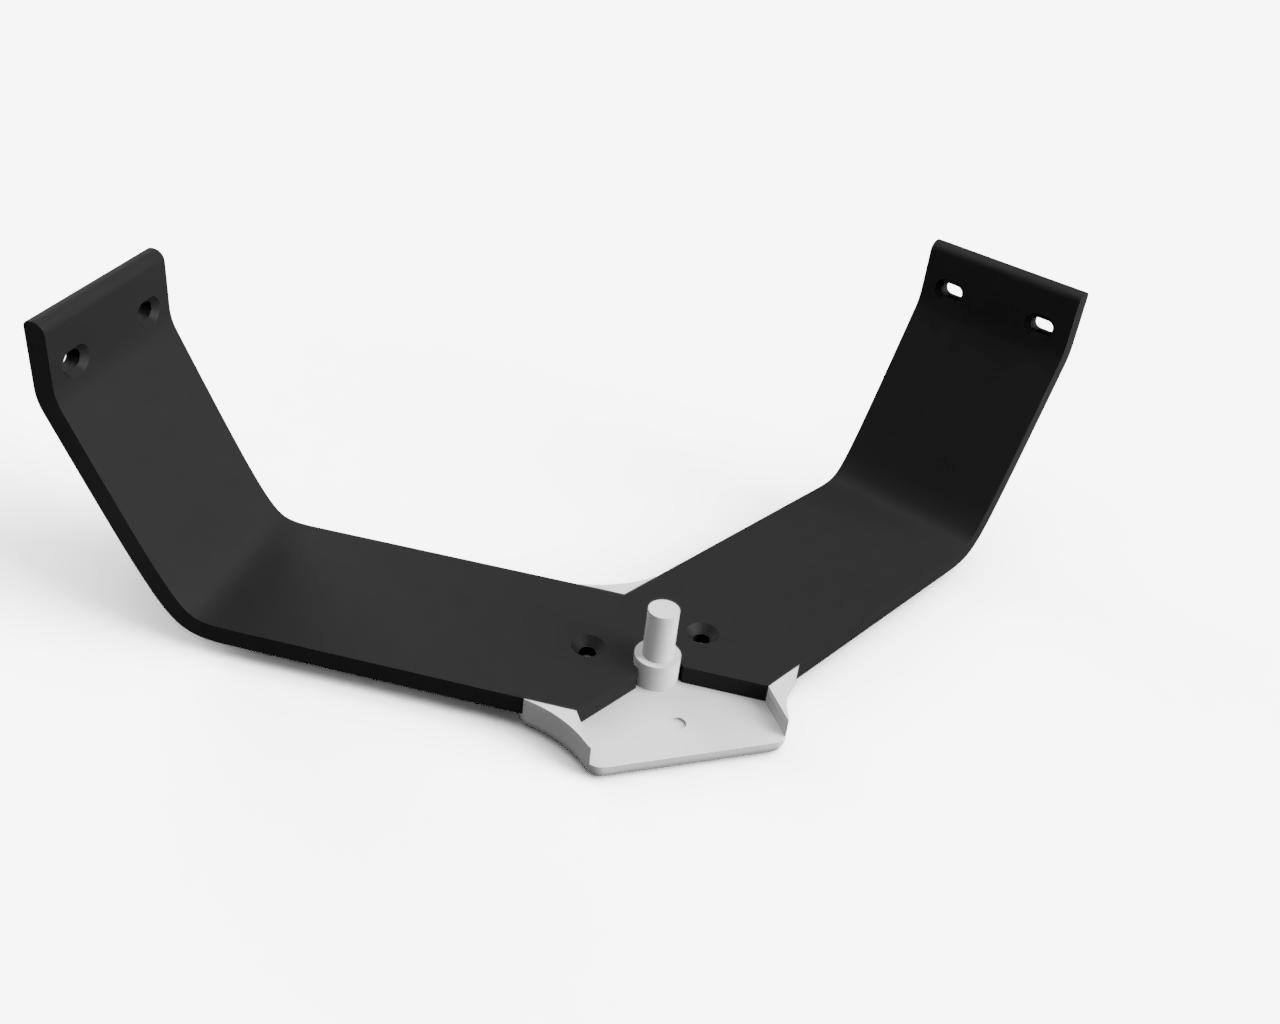 2.png Download free STL file Anycubic Kossel 608 Bearing Top Spool Holder • 3D printable model, VICLER